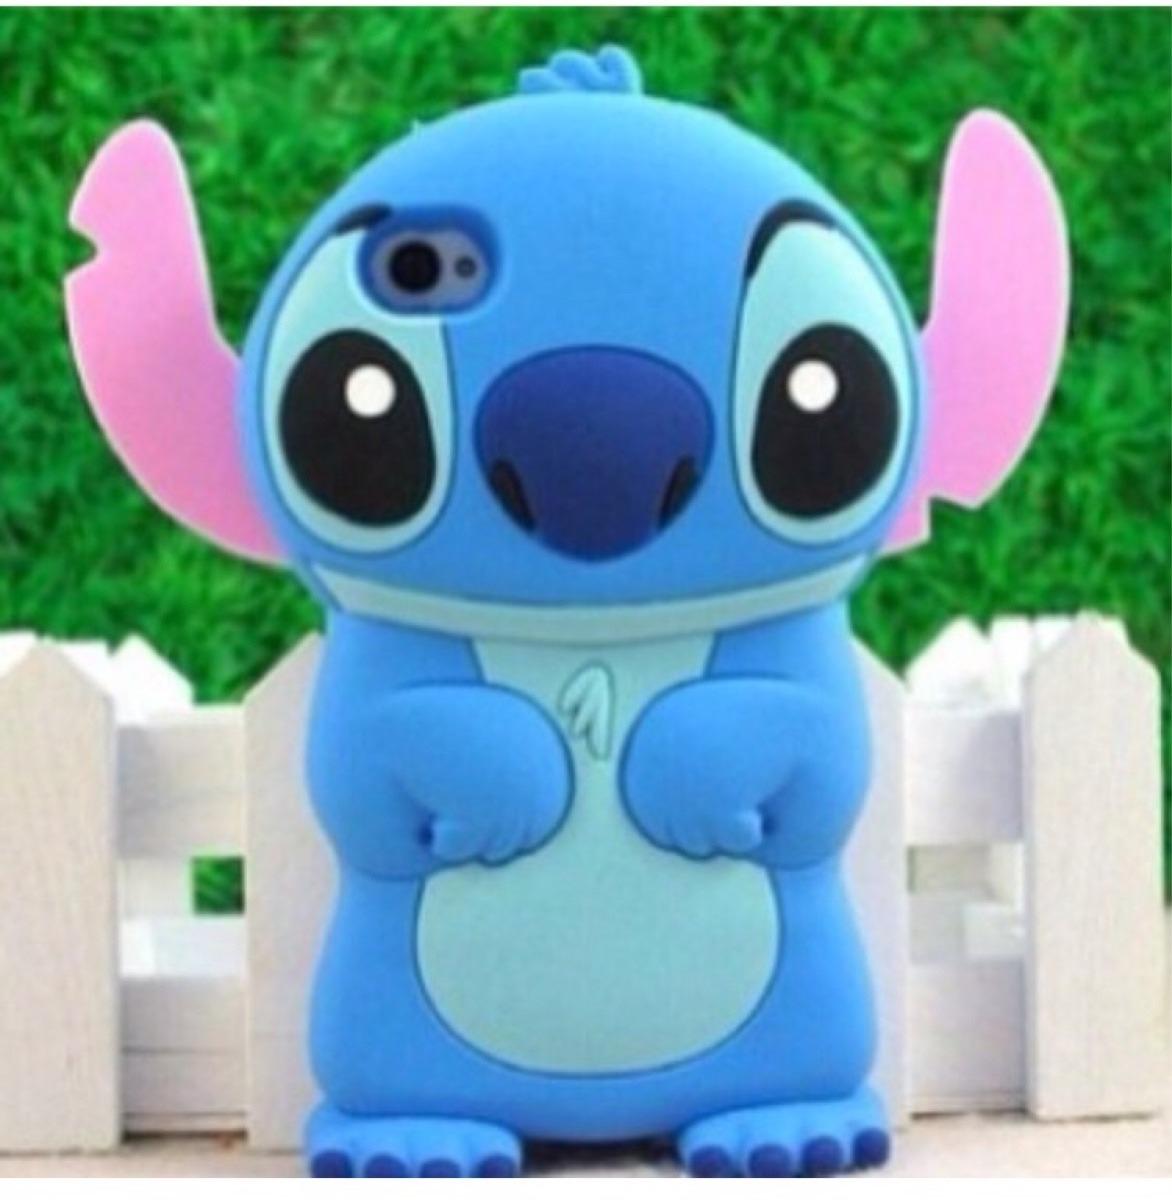 dda58763b68 Forro Protector Funda Goma Estuche iPhone 4 4s Stitch - Bs. 36.450,00 en  Mercado Libre